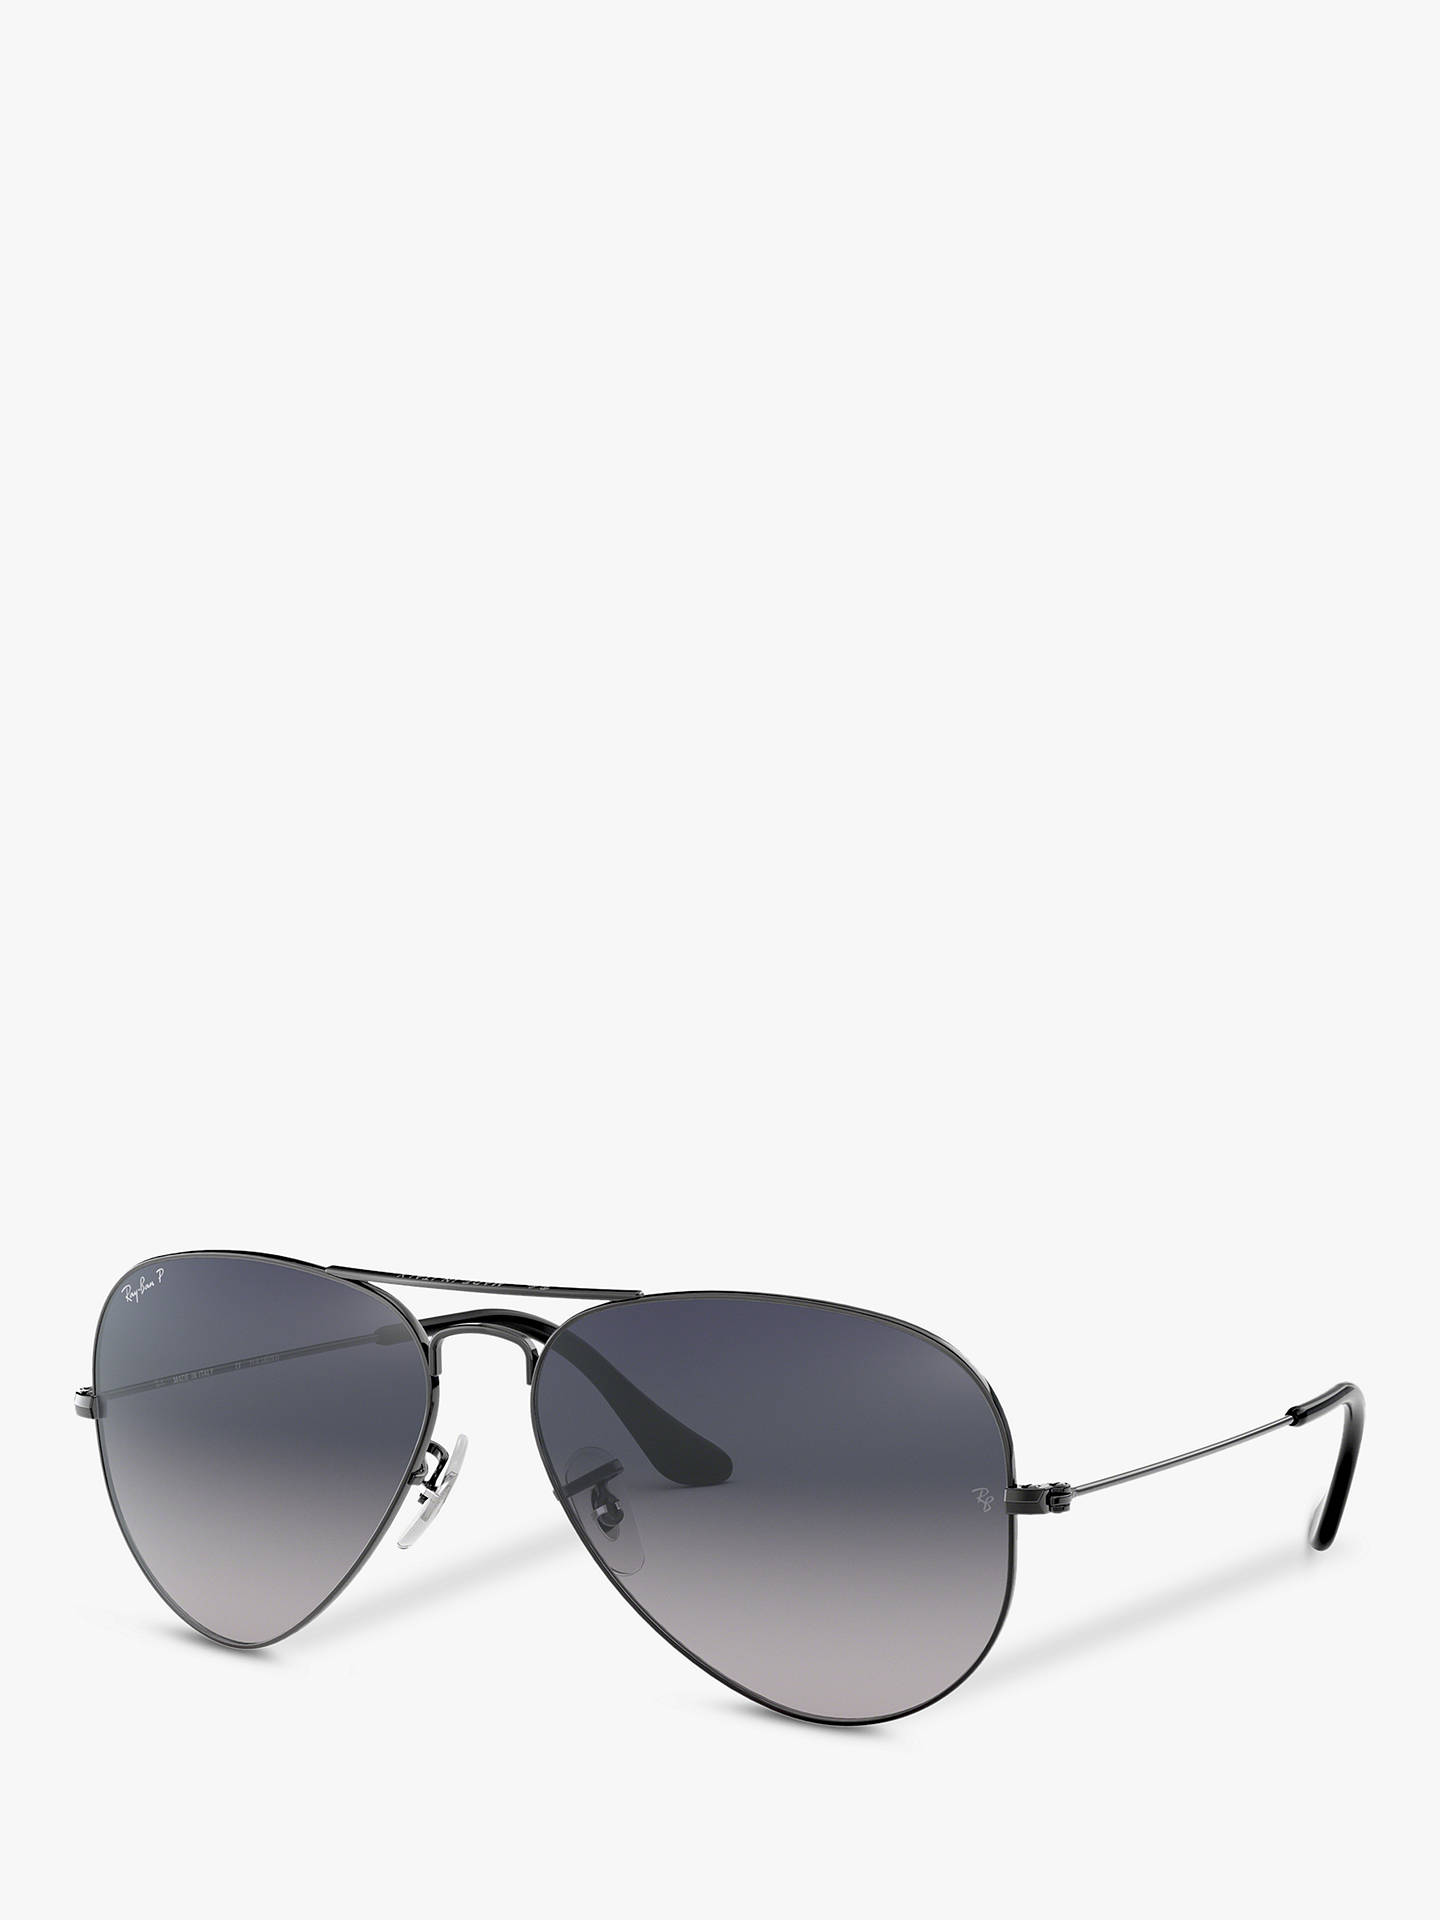 52a628ecb85 Buy Ray-Ban RB3025 004/78 Aviator Sunglasses, Gunmetal Online at johnlewis.